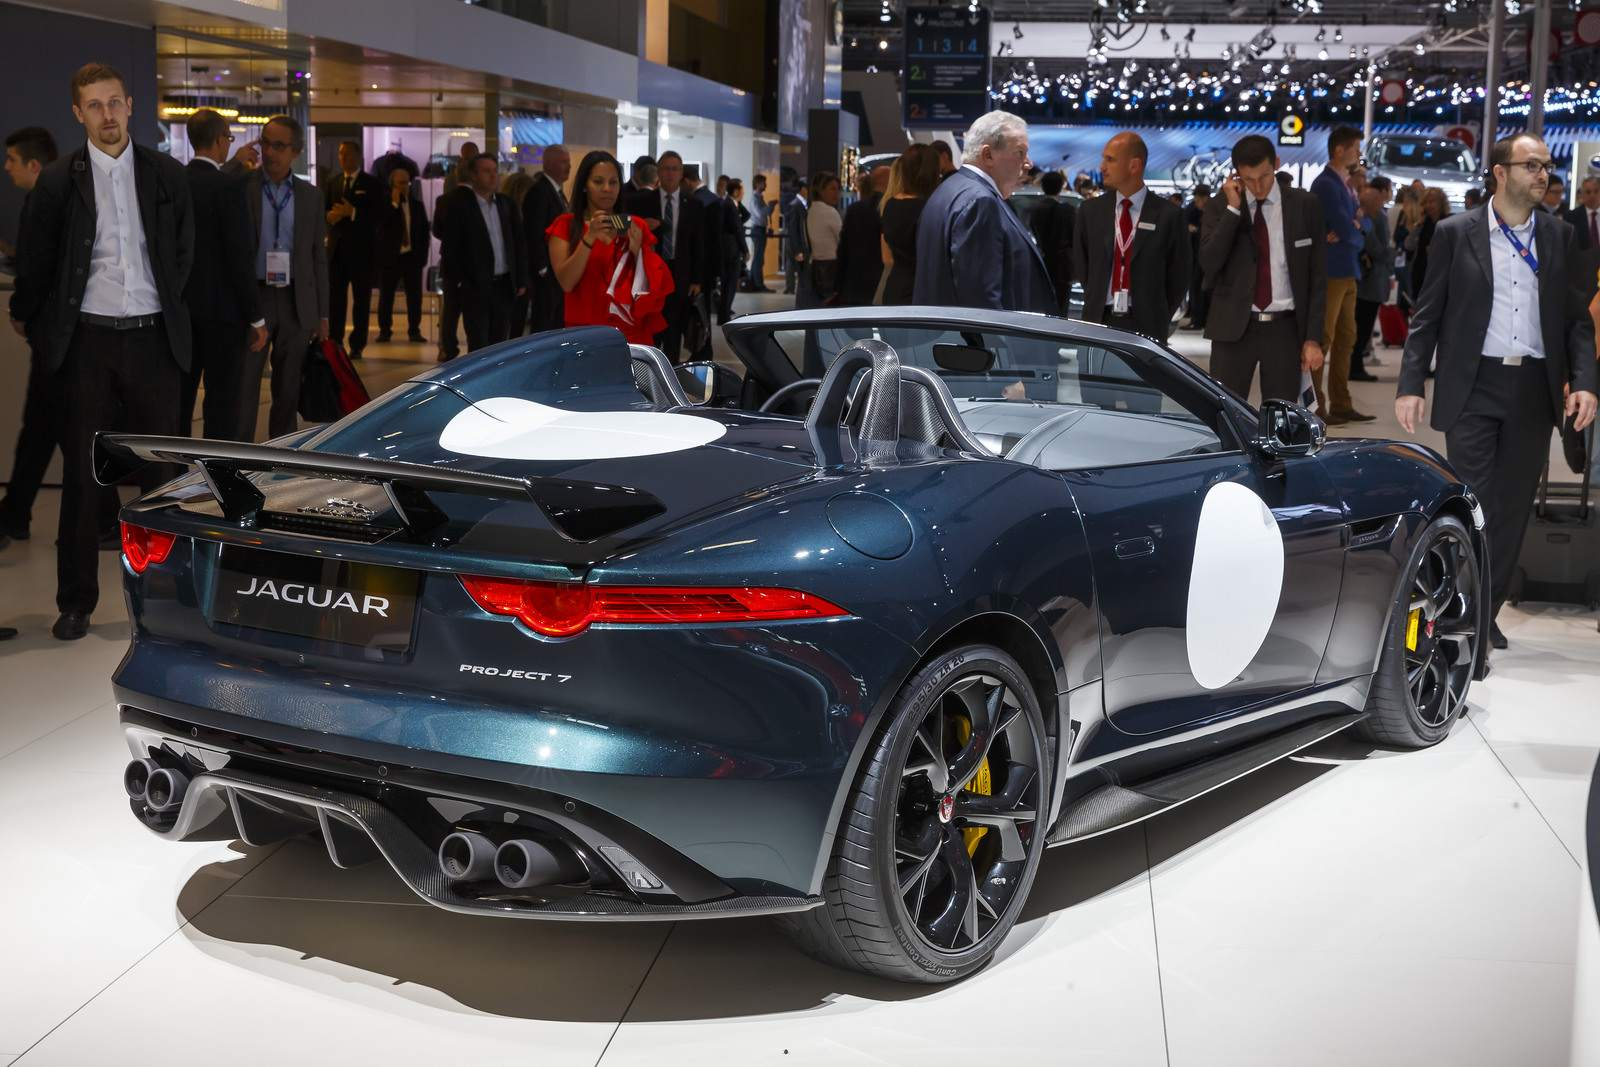 paris motor show9 Jaguar and Land Rover at Paris Auto Show 2014